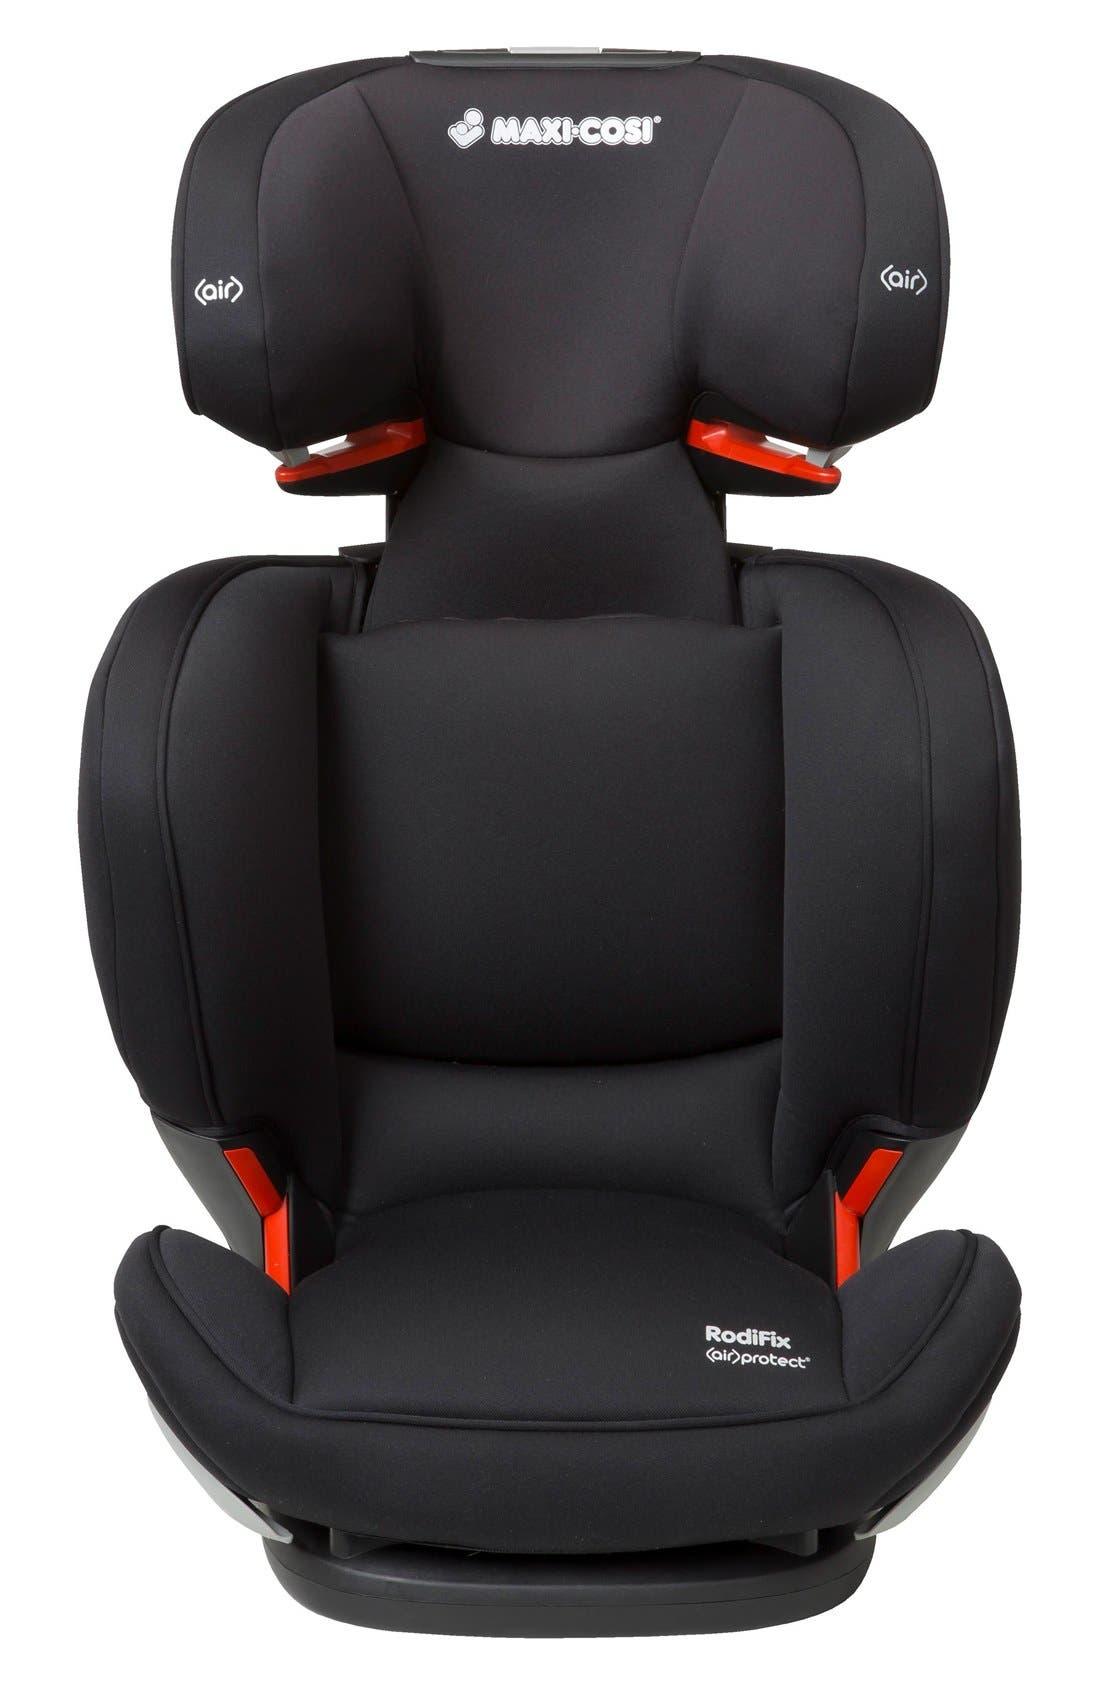 RodiFix Booster Car Seat,                         Main,                         color, 005